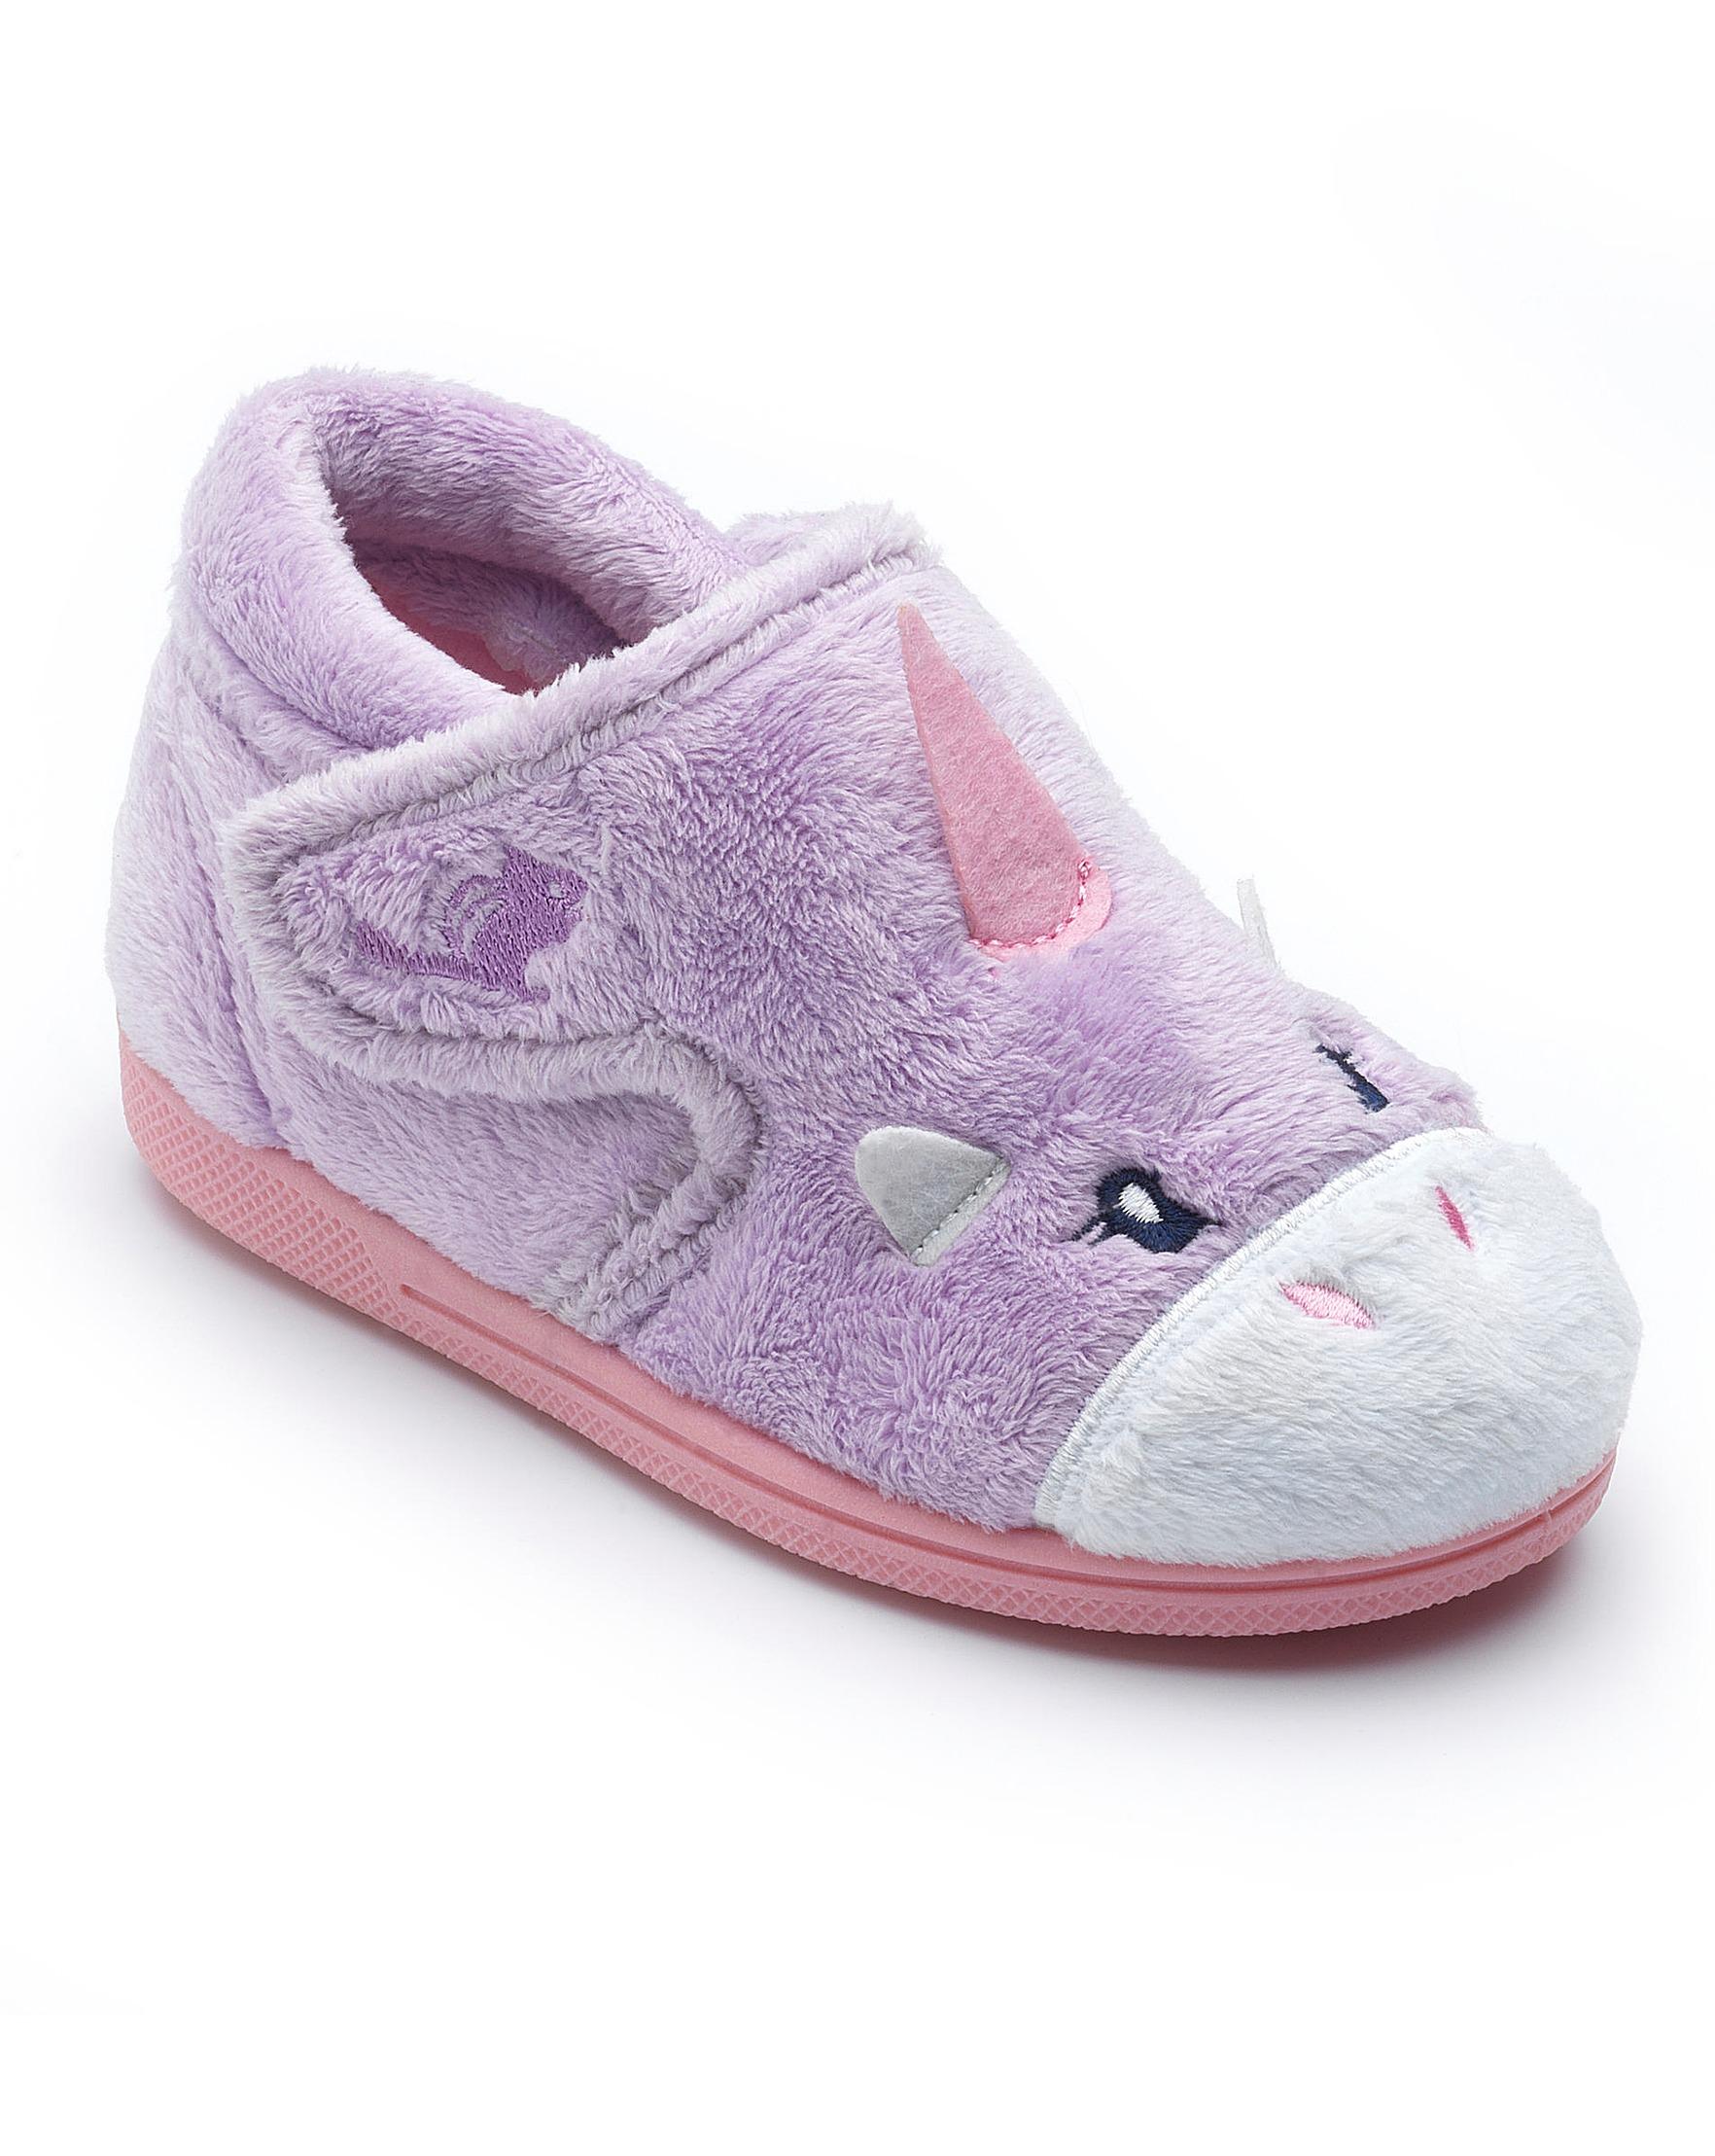 Chipmunks Unicorn Slippers